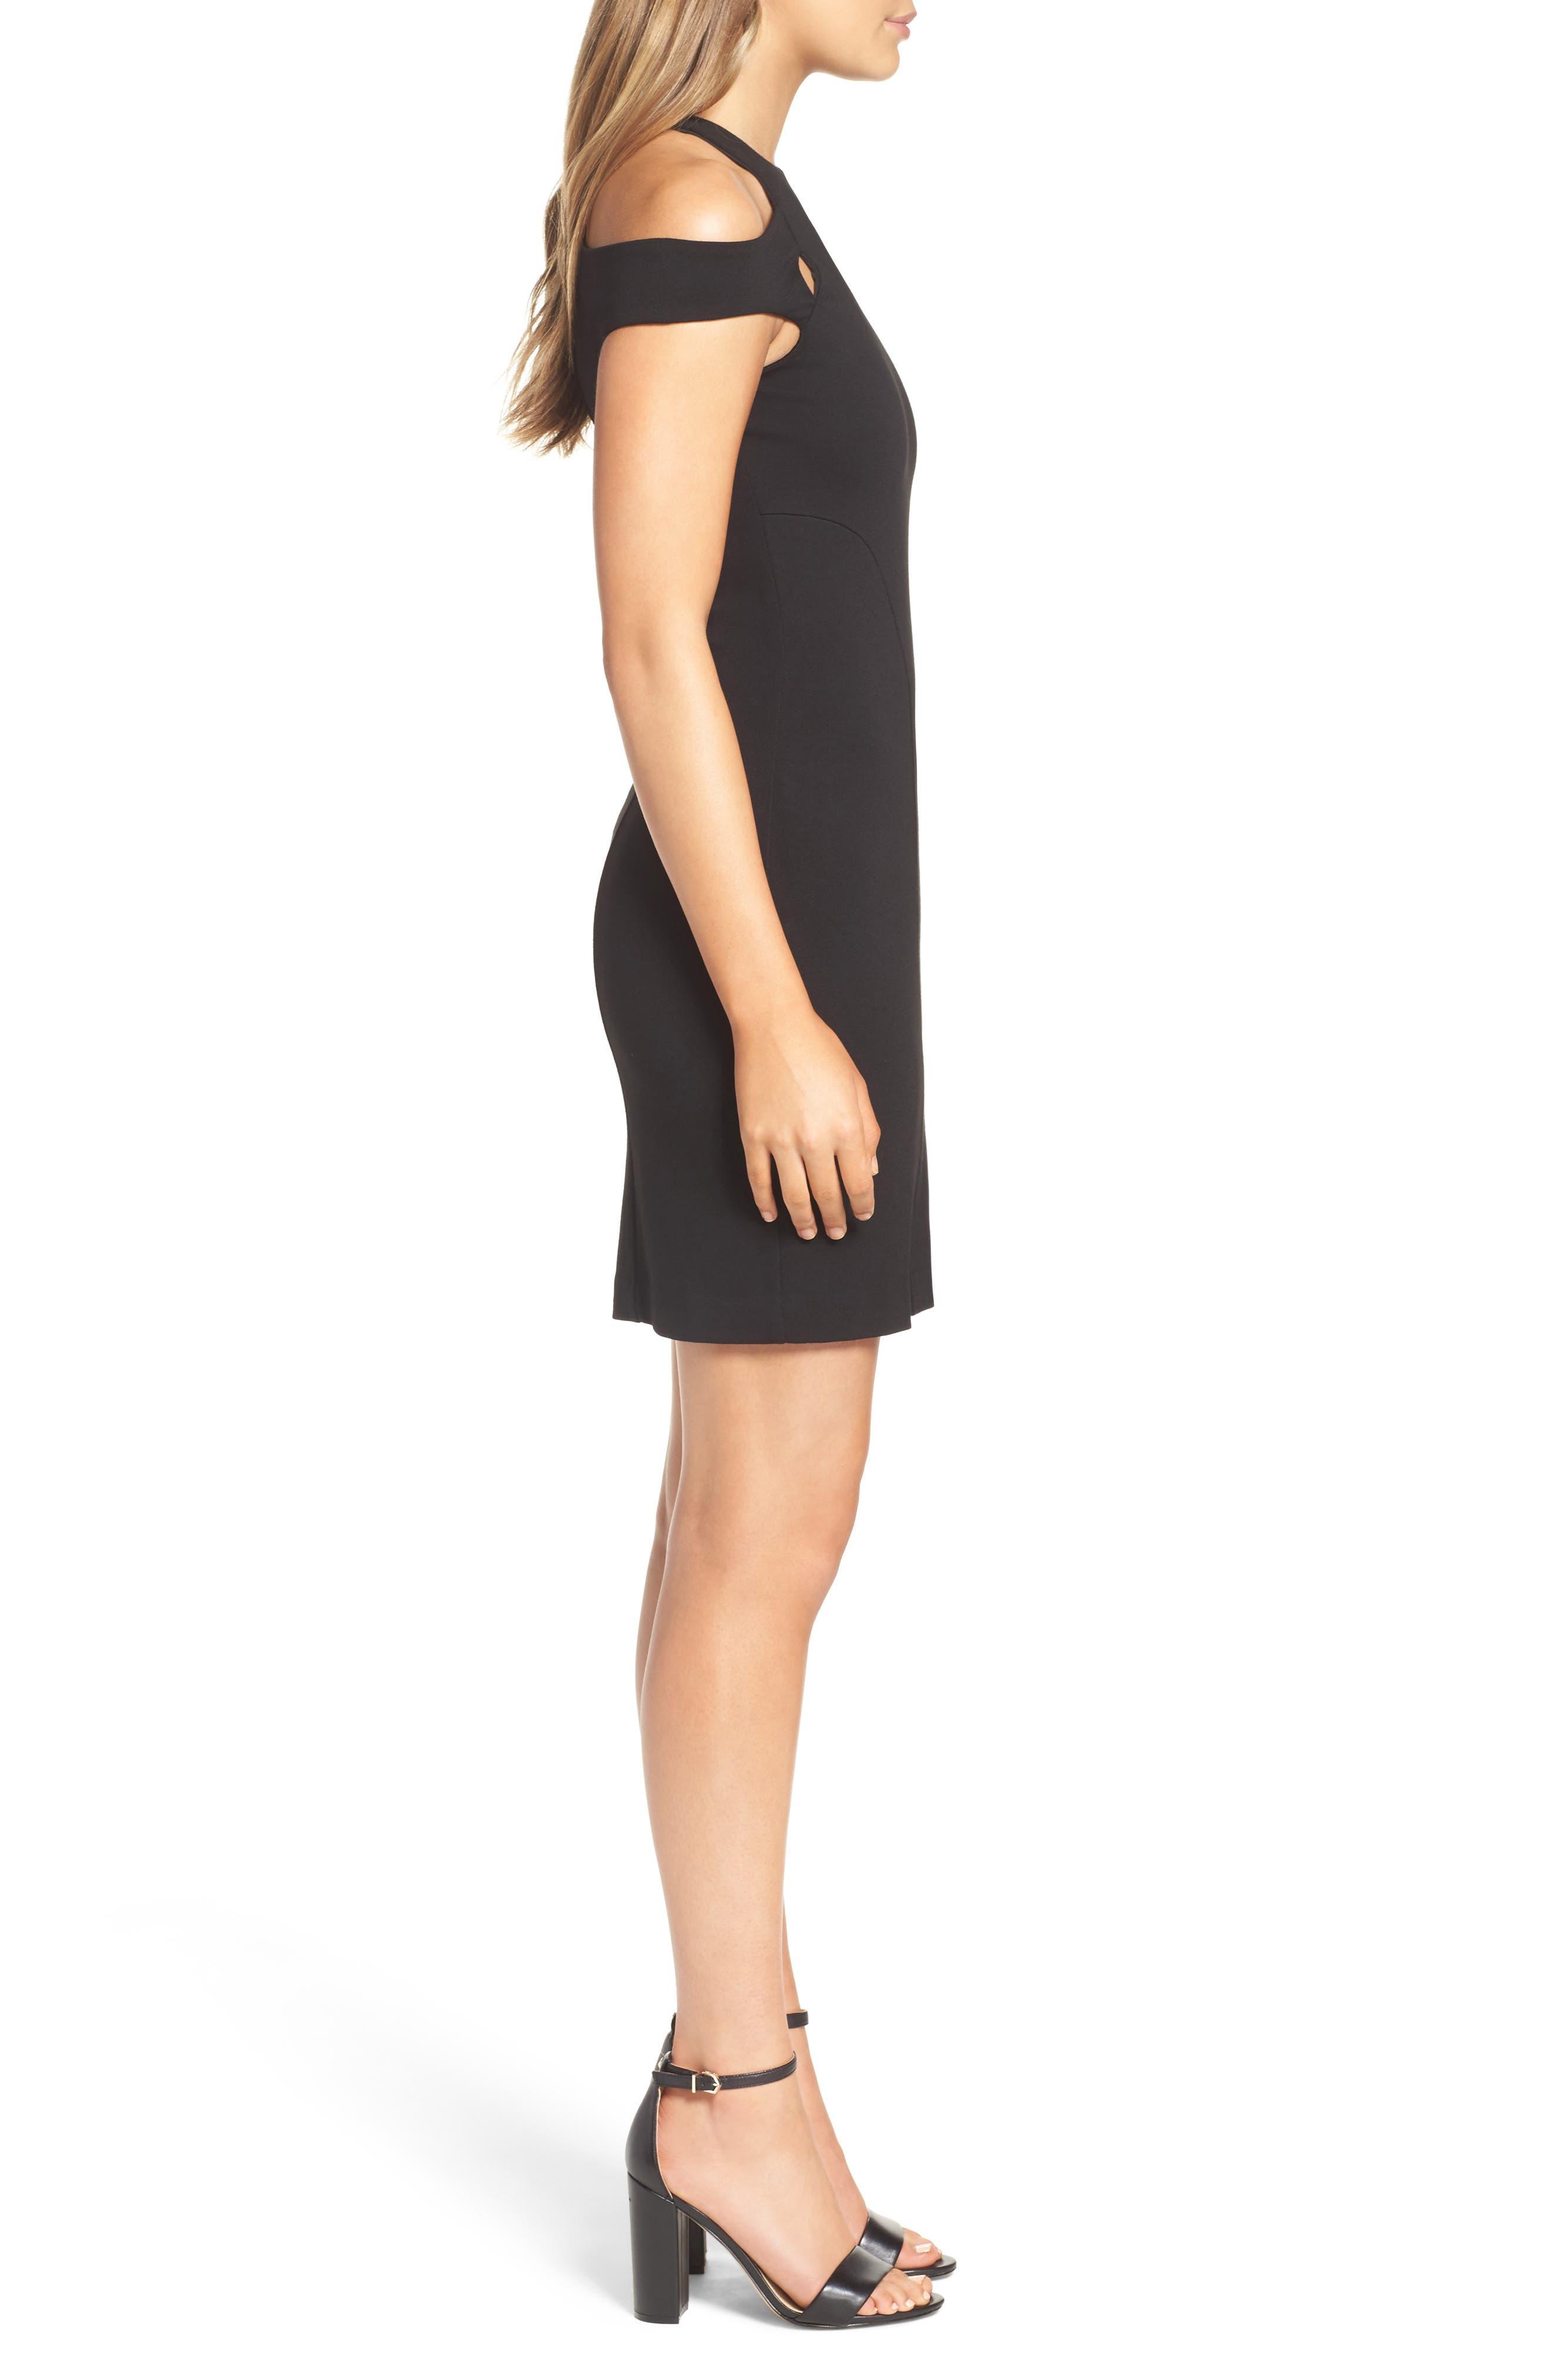 Muy Caliente Cold Shoulder Body-Con Dress,                             Alternate thumbnail 3, color,                             001